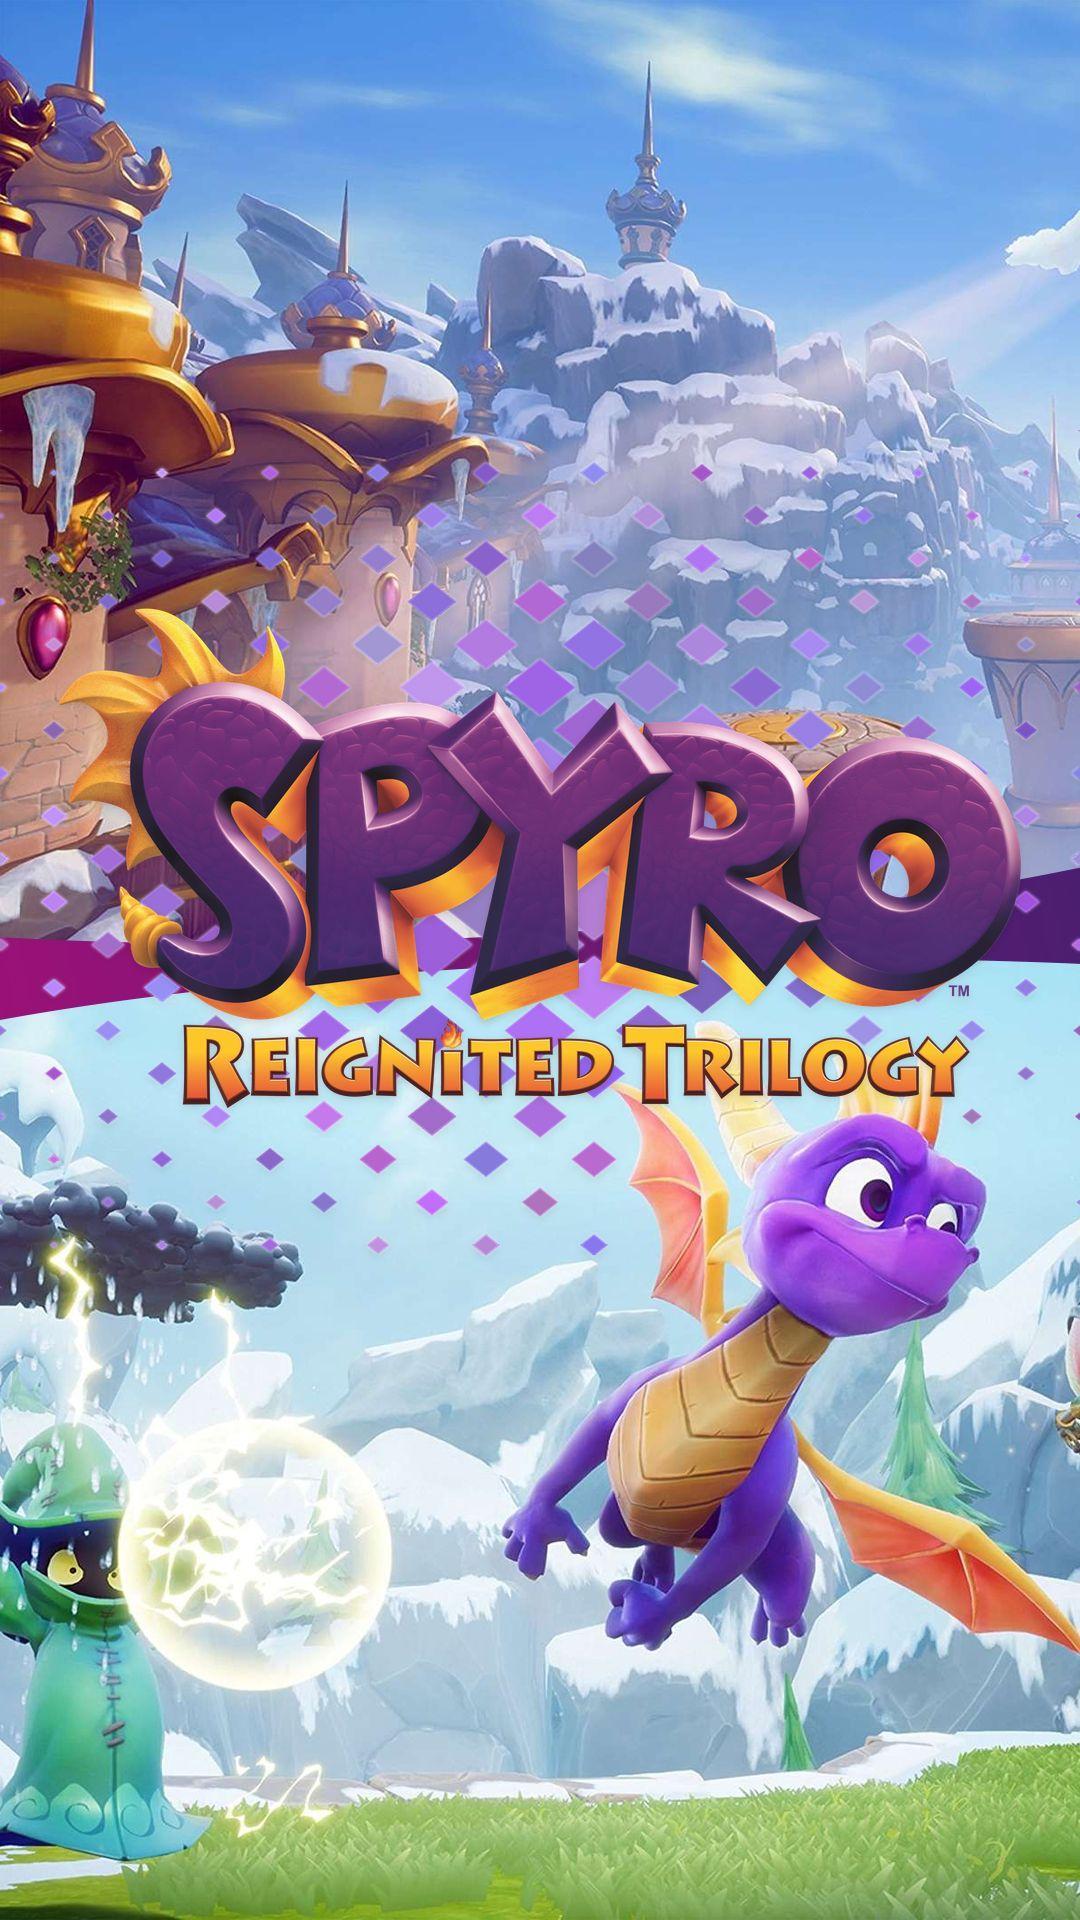 Spyro reignited trilogy wallpapers wallpaper cave - Spyro wallpaper ...